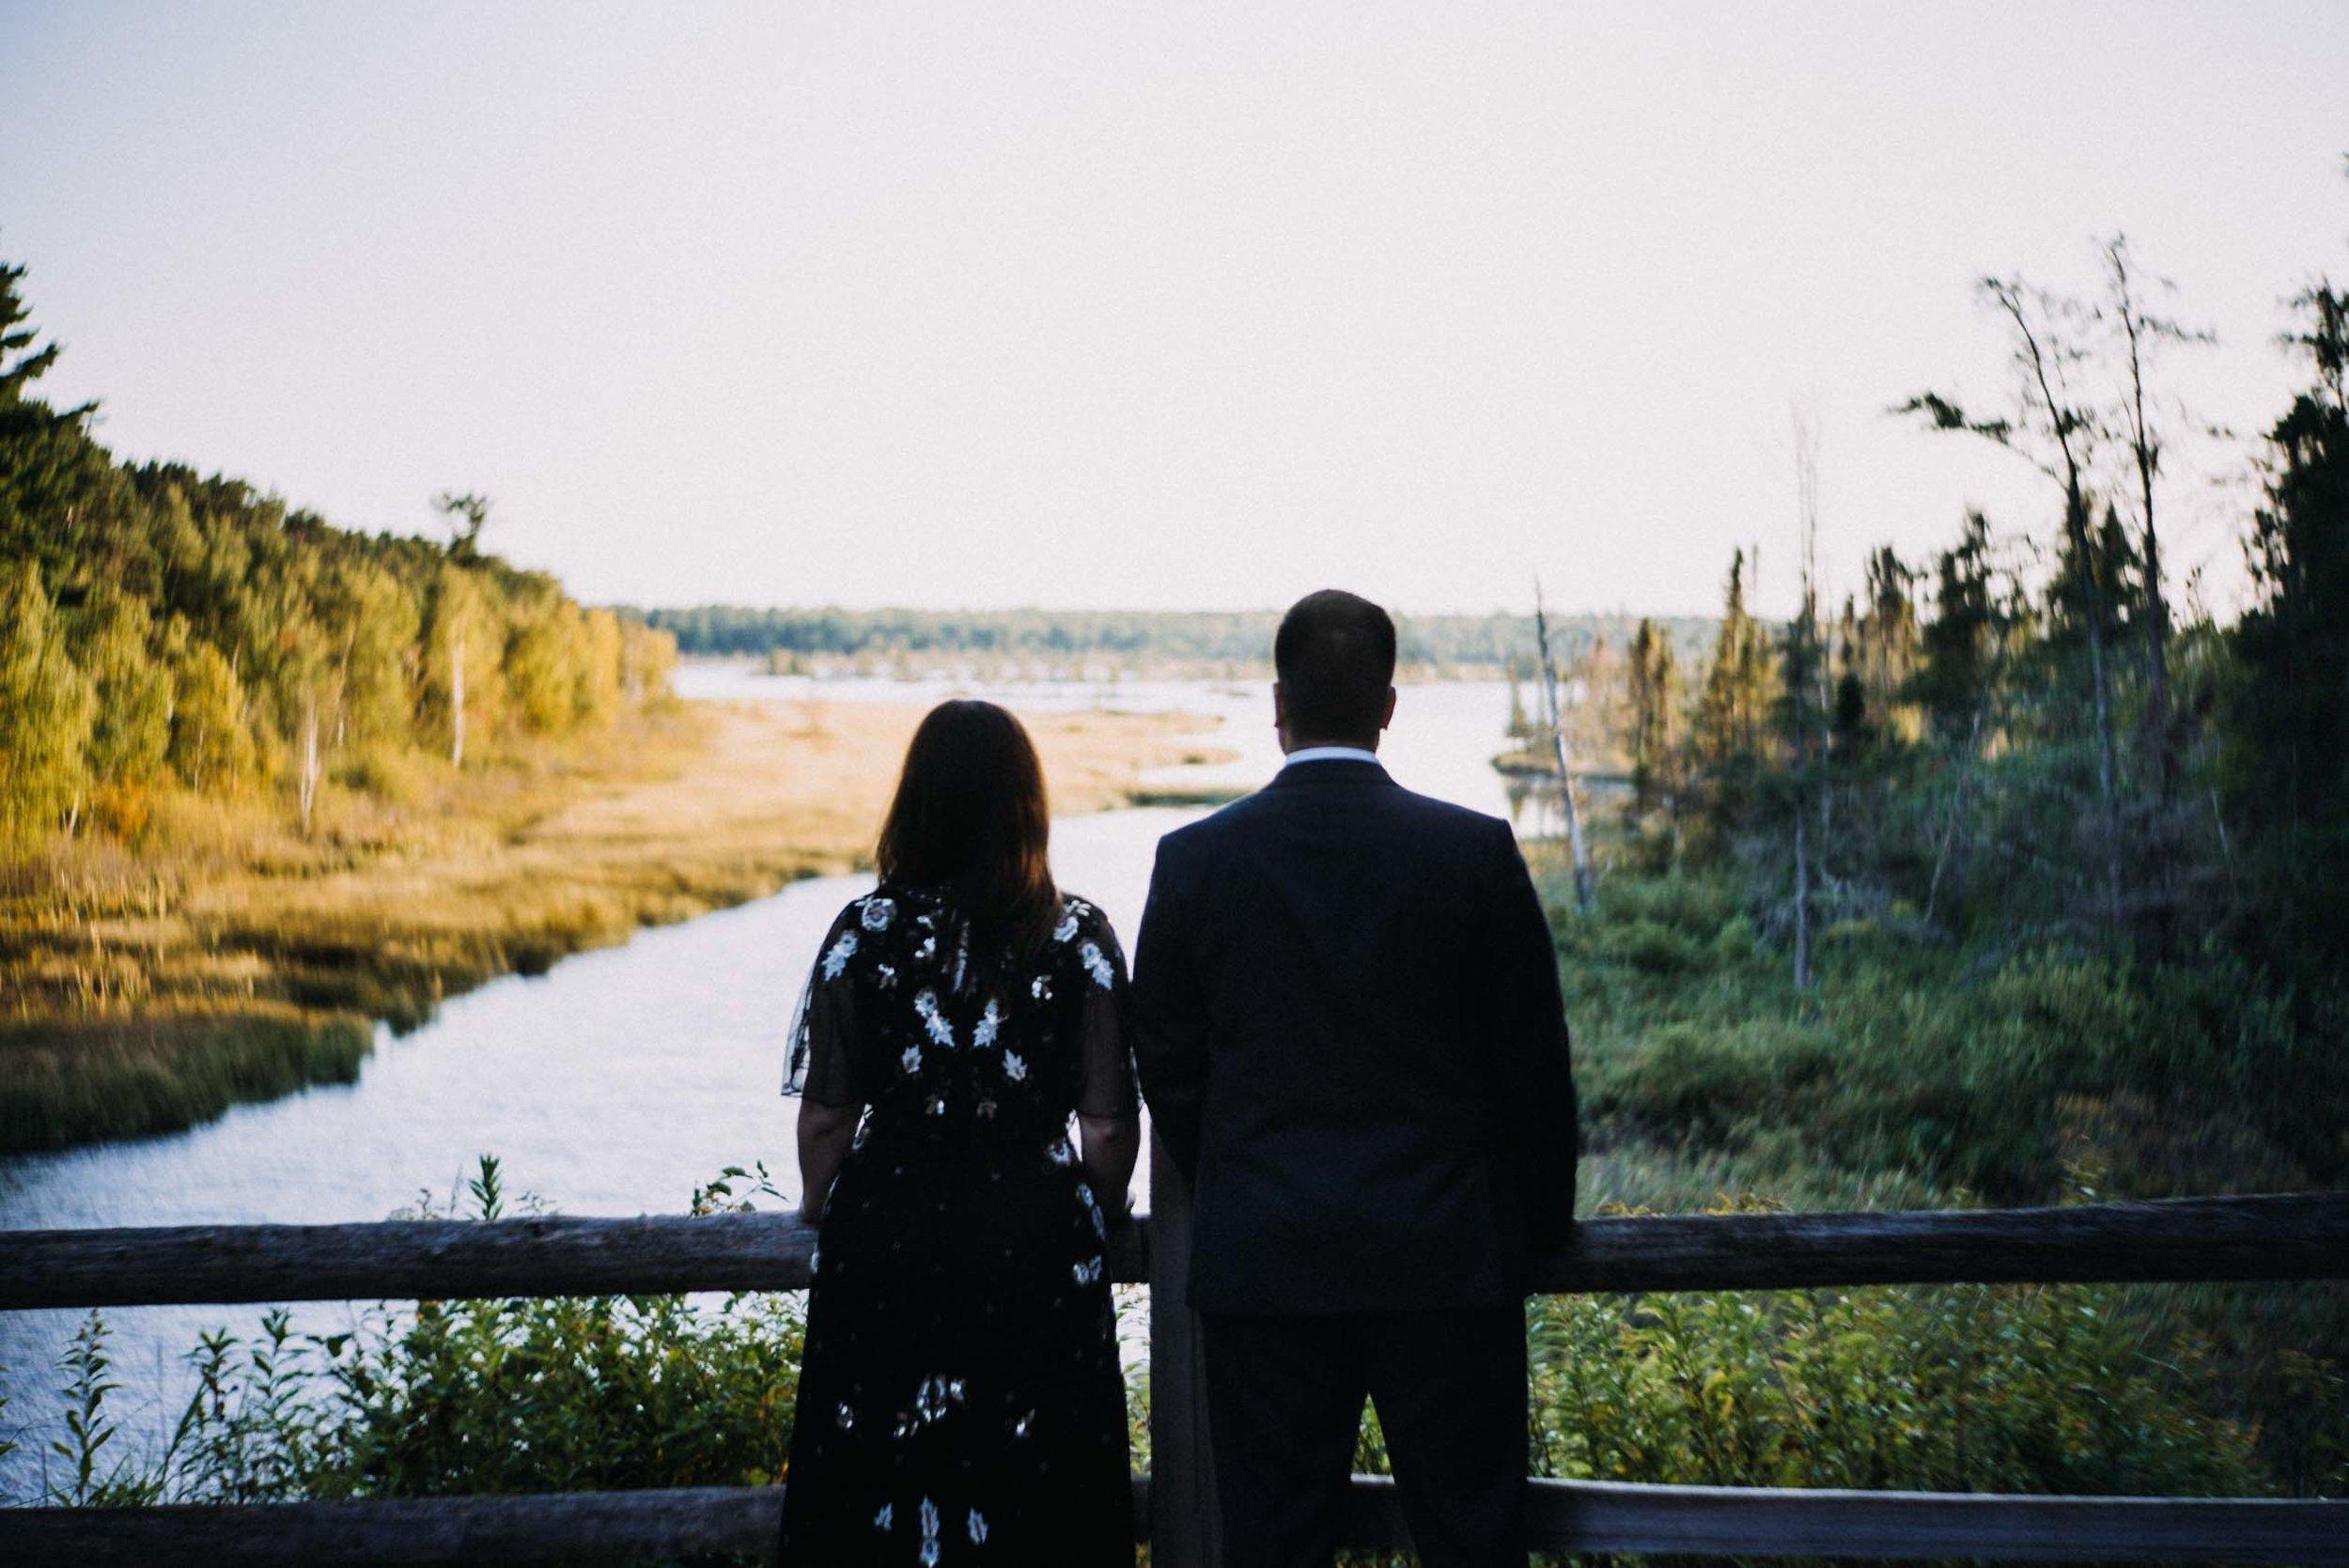 bayfield_madeline_island_wisconsin_wedding_engagement_session-5783.JPG